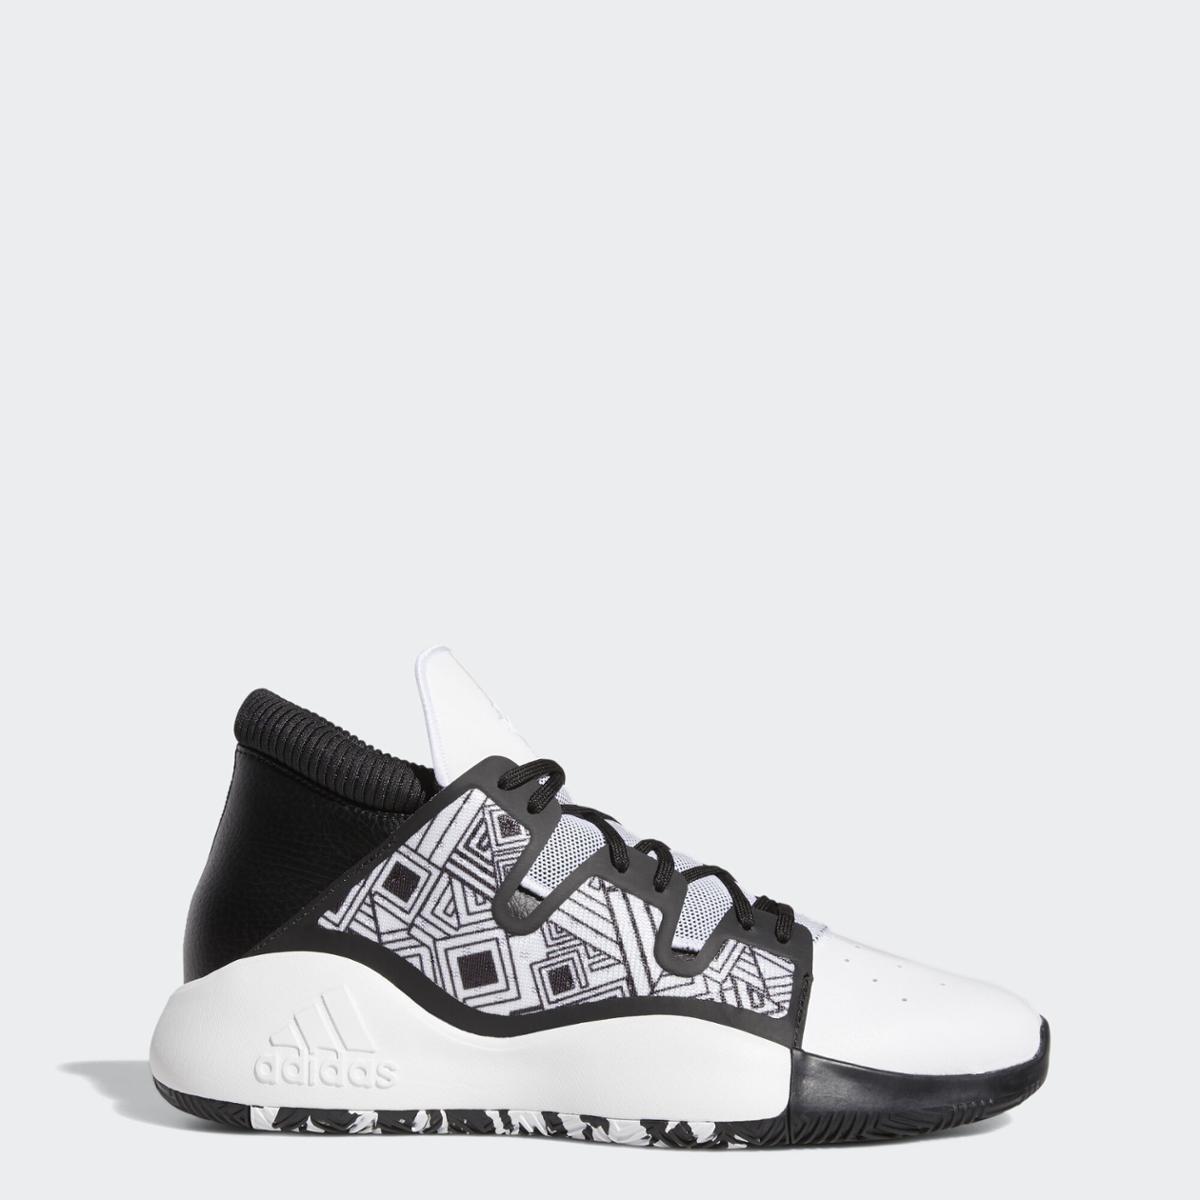 e41c05019e Tênis Pro Vision Adidas Masculino - Branco | Netshoes